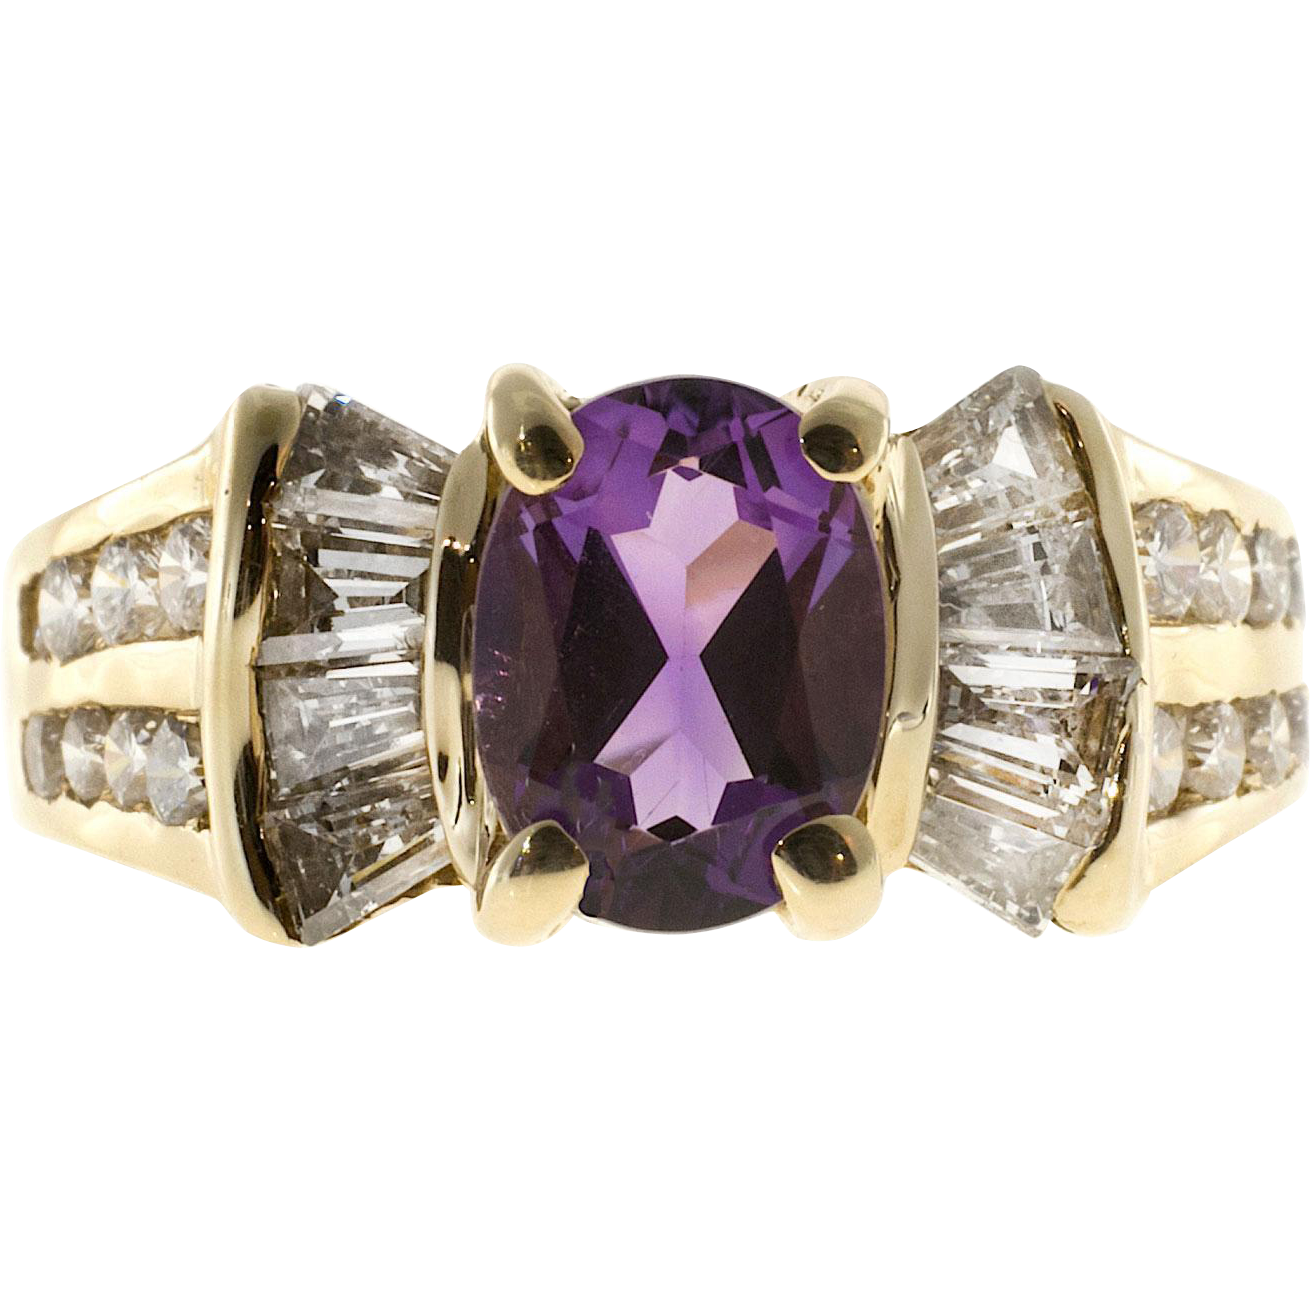 Oval Amethyst Diamond Baguette 14 Karat Gold Ring